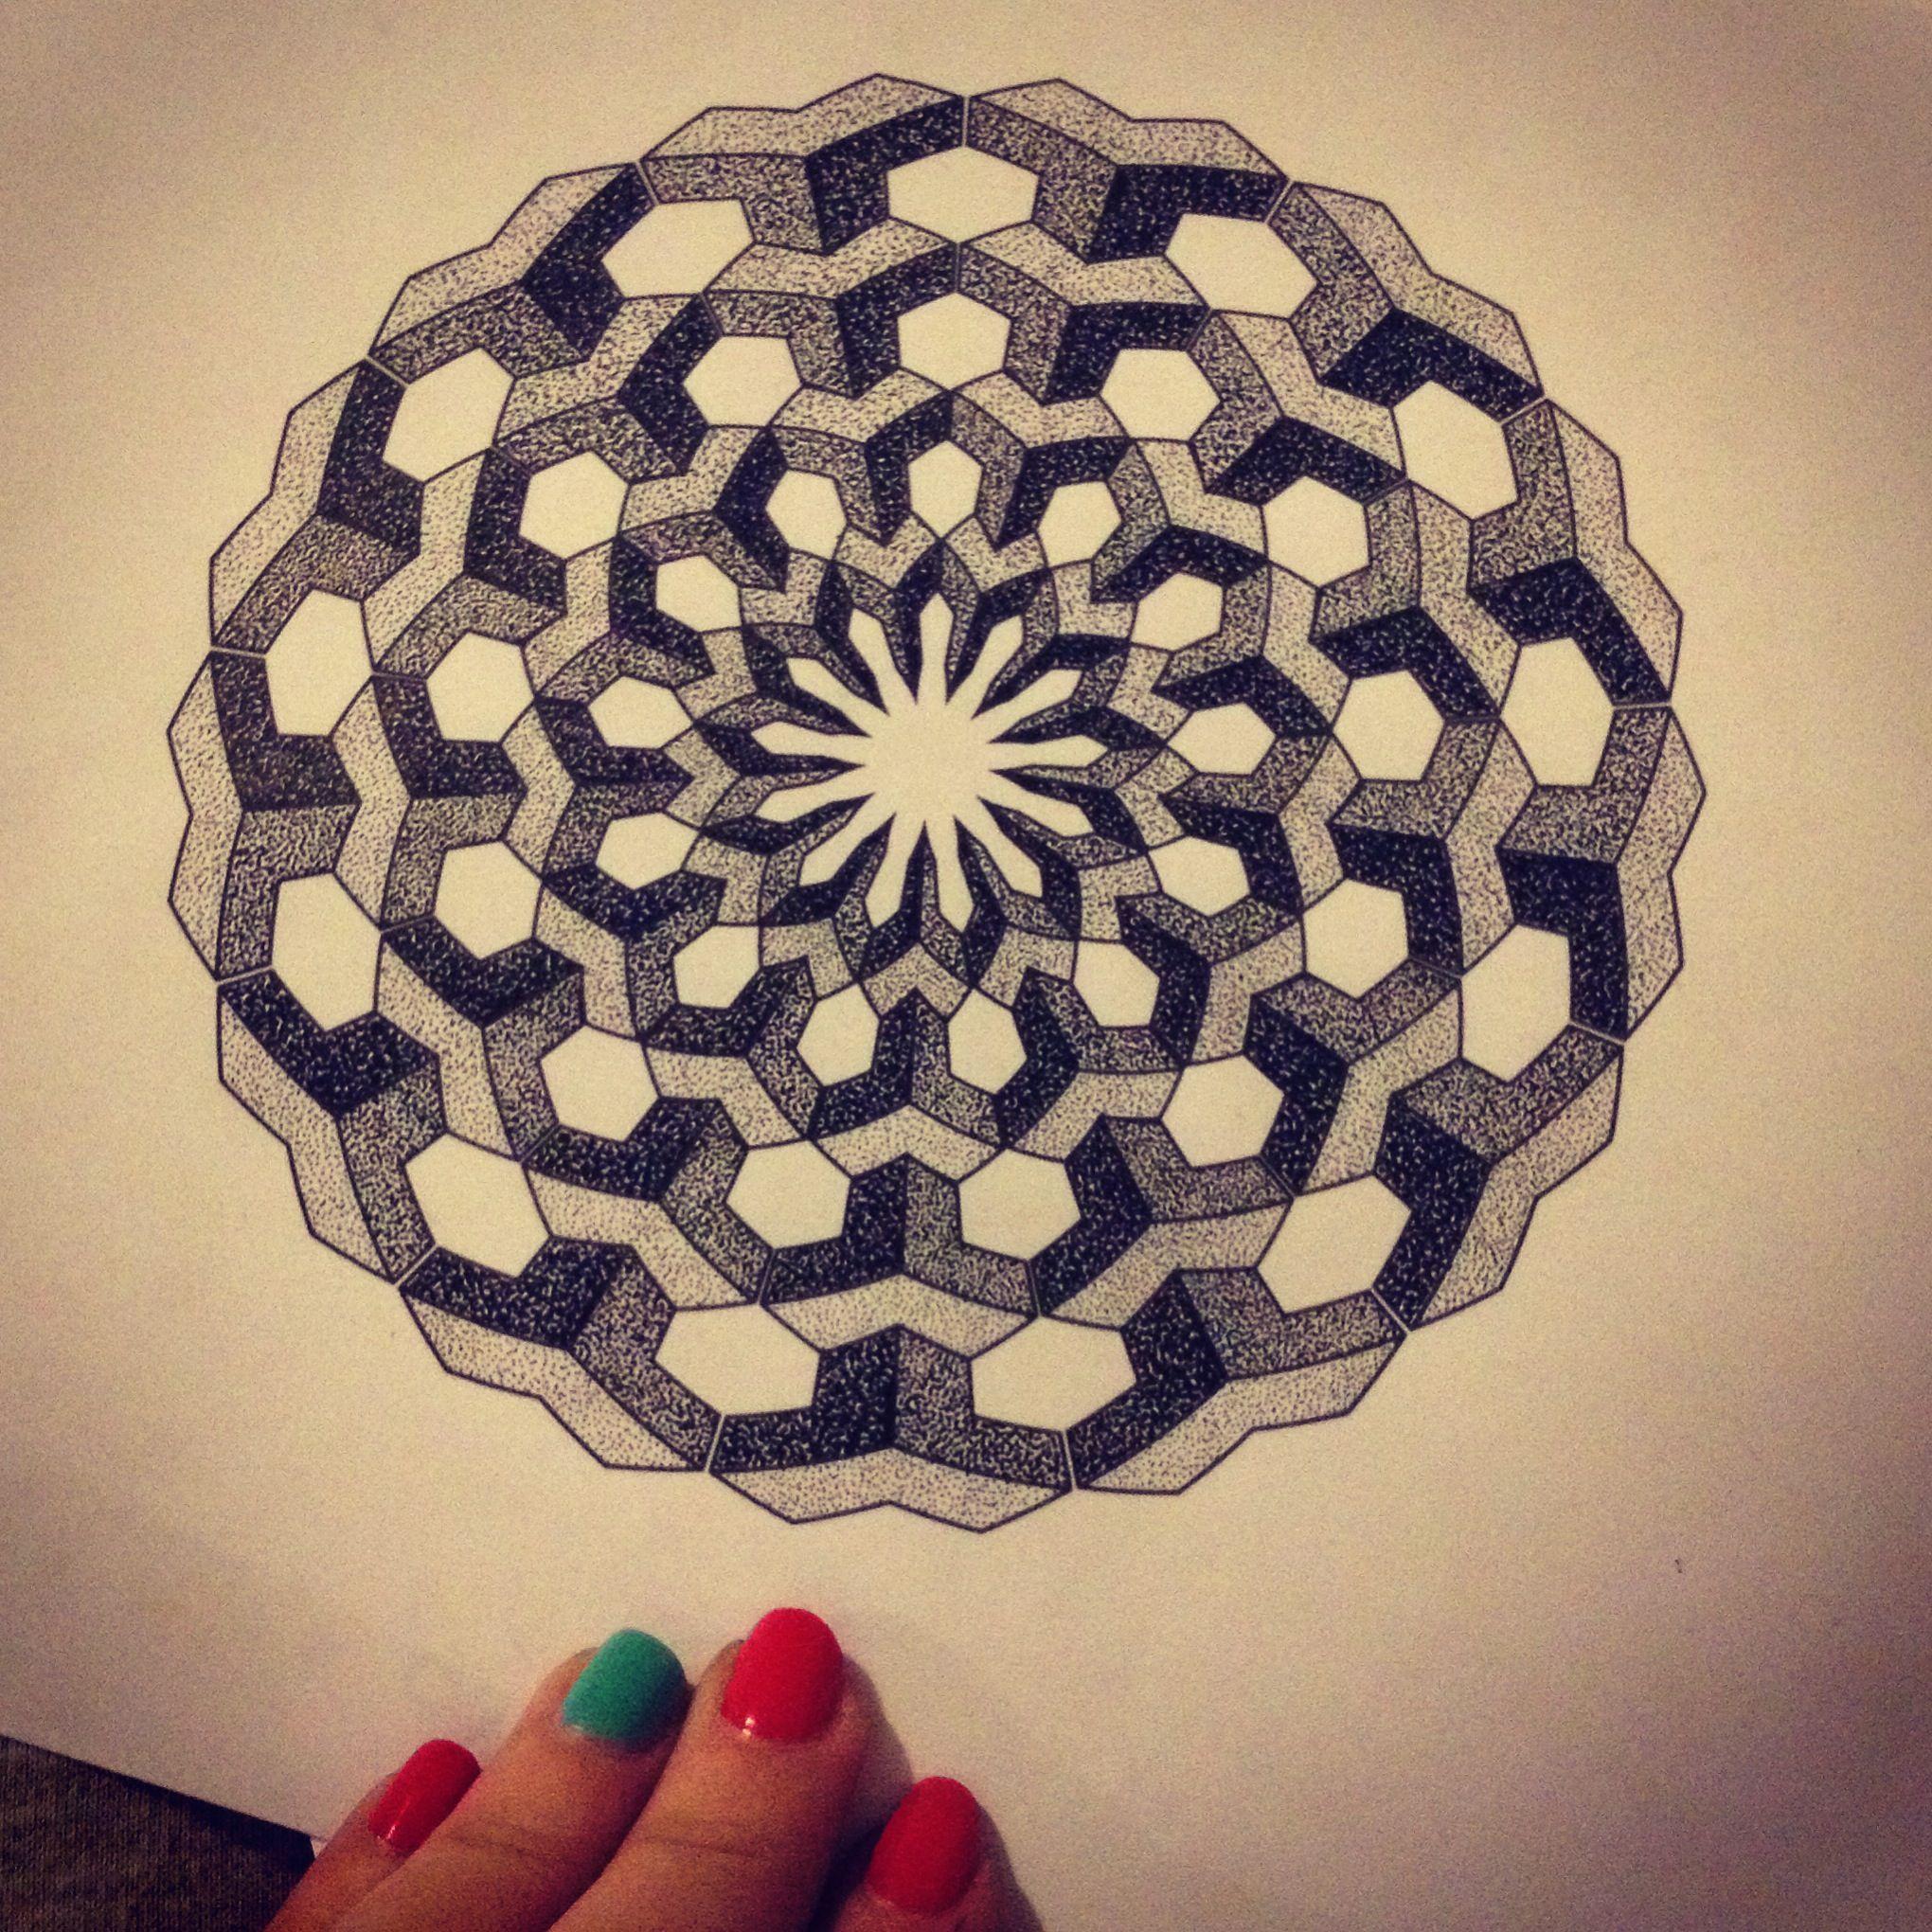 geometric dotwork mandala design by natasha papadakos tattoos pinterest natasha o 39 keeffe. Black Bedroom Furniture Sets. Home Design Ideas